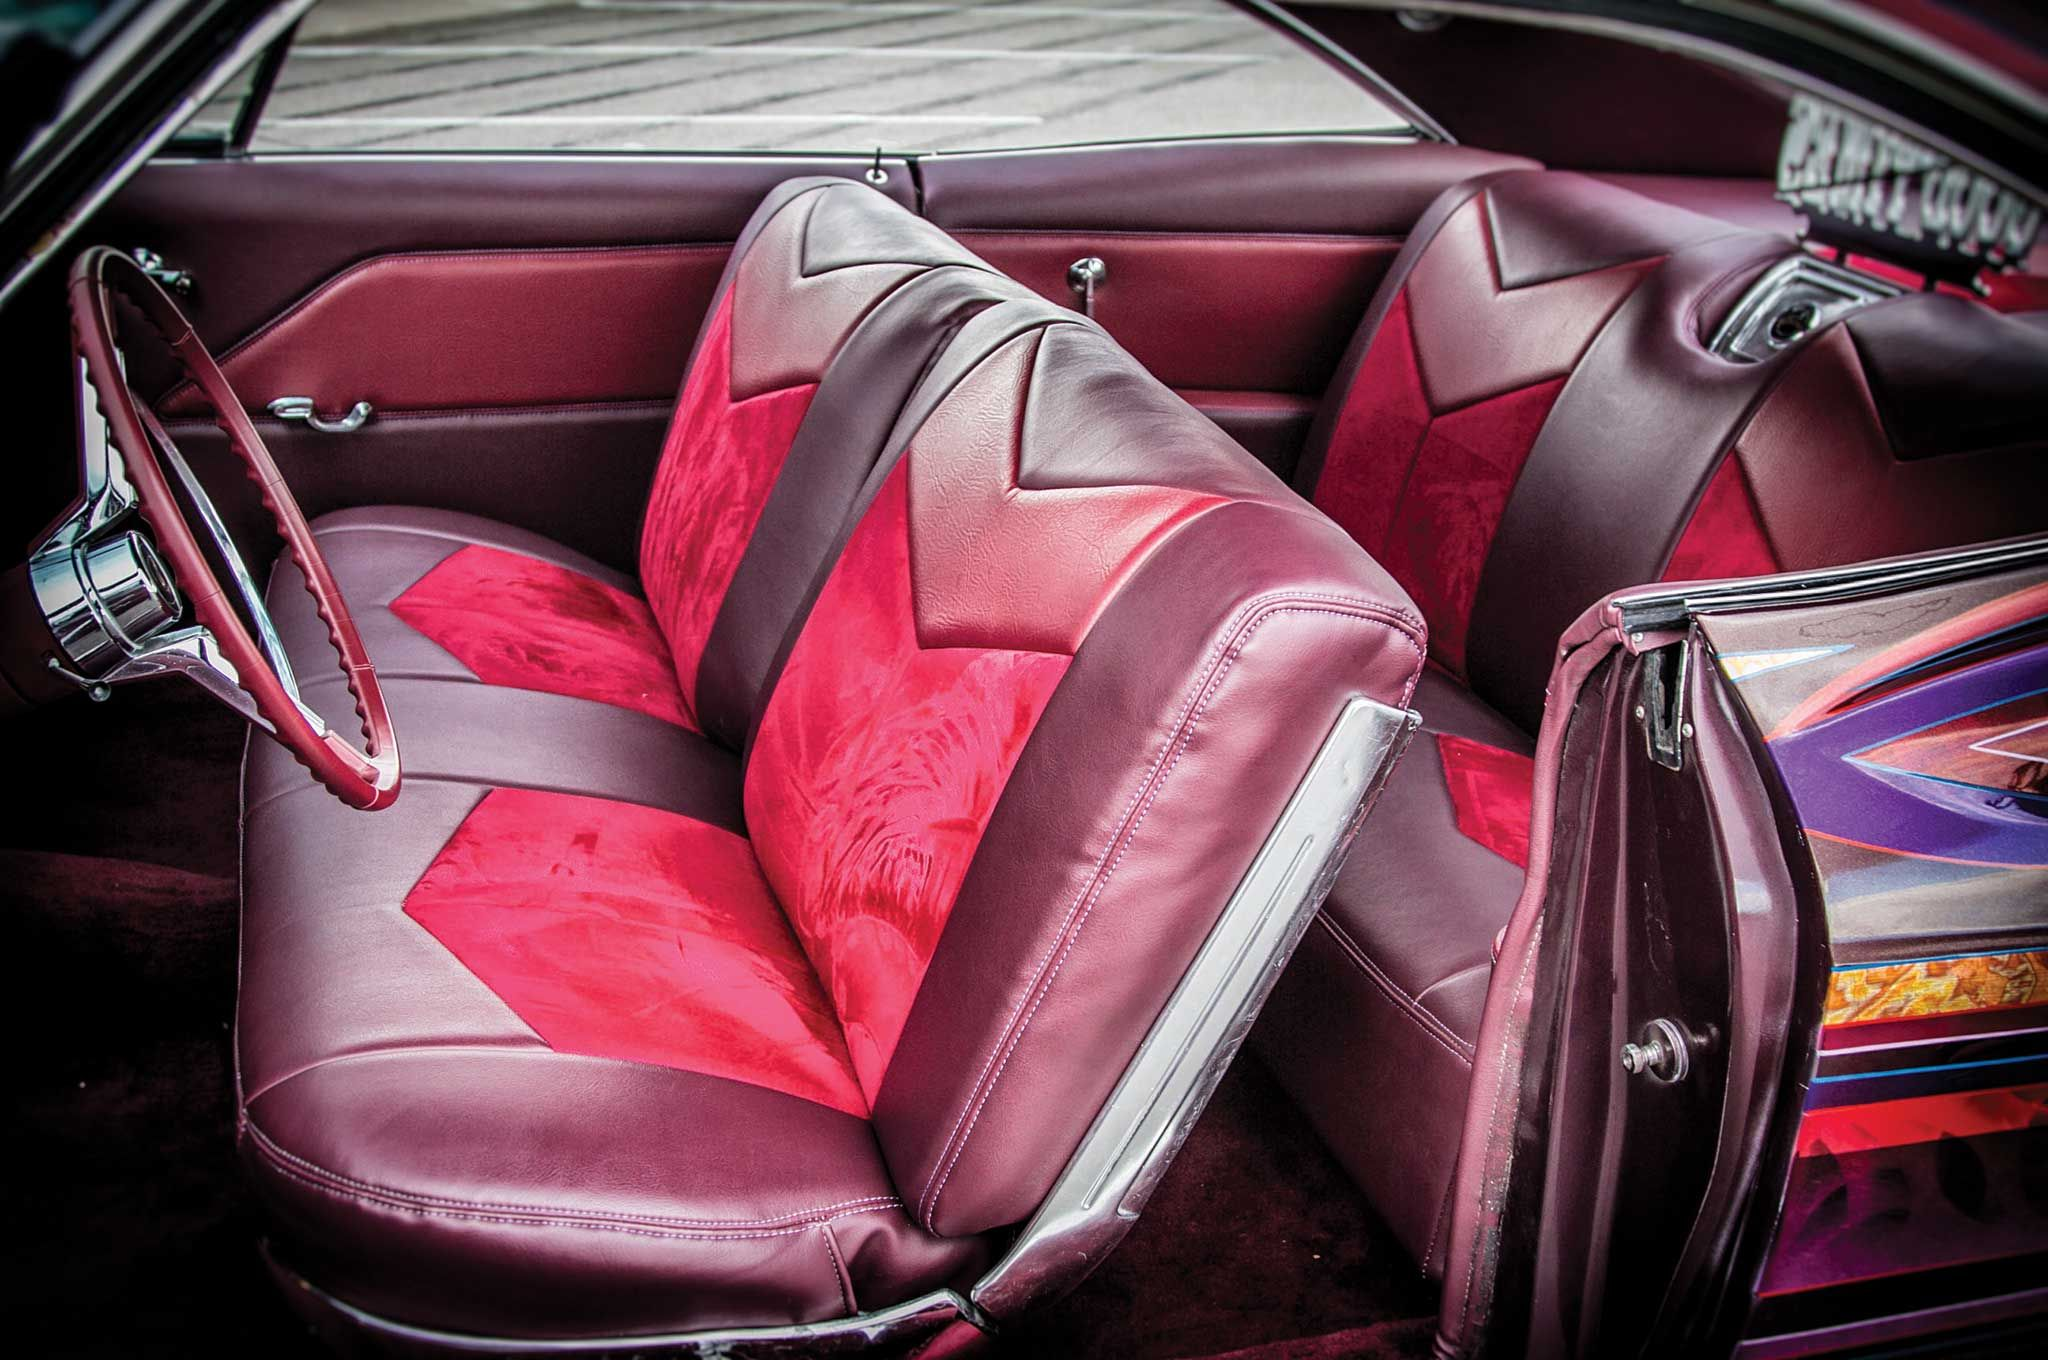 Stupendous 1966 Chevrolet Impala Custom Interior Impala Interior Theyellowbook Wood Chair Design Ideas Theyellowbookinfo